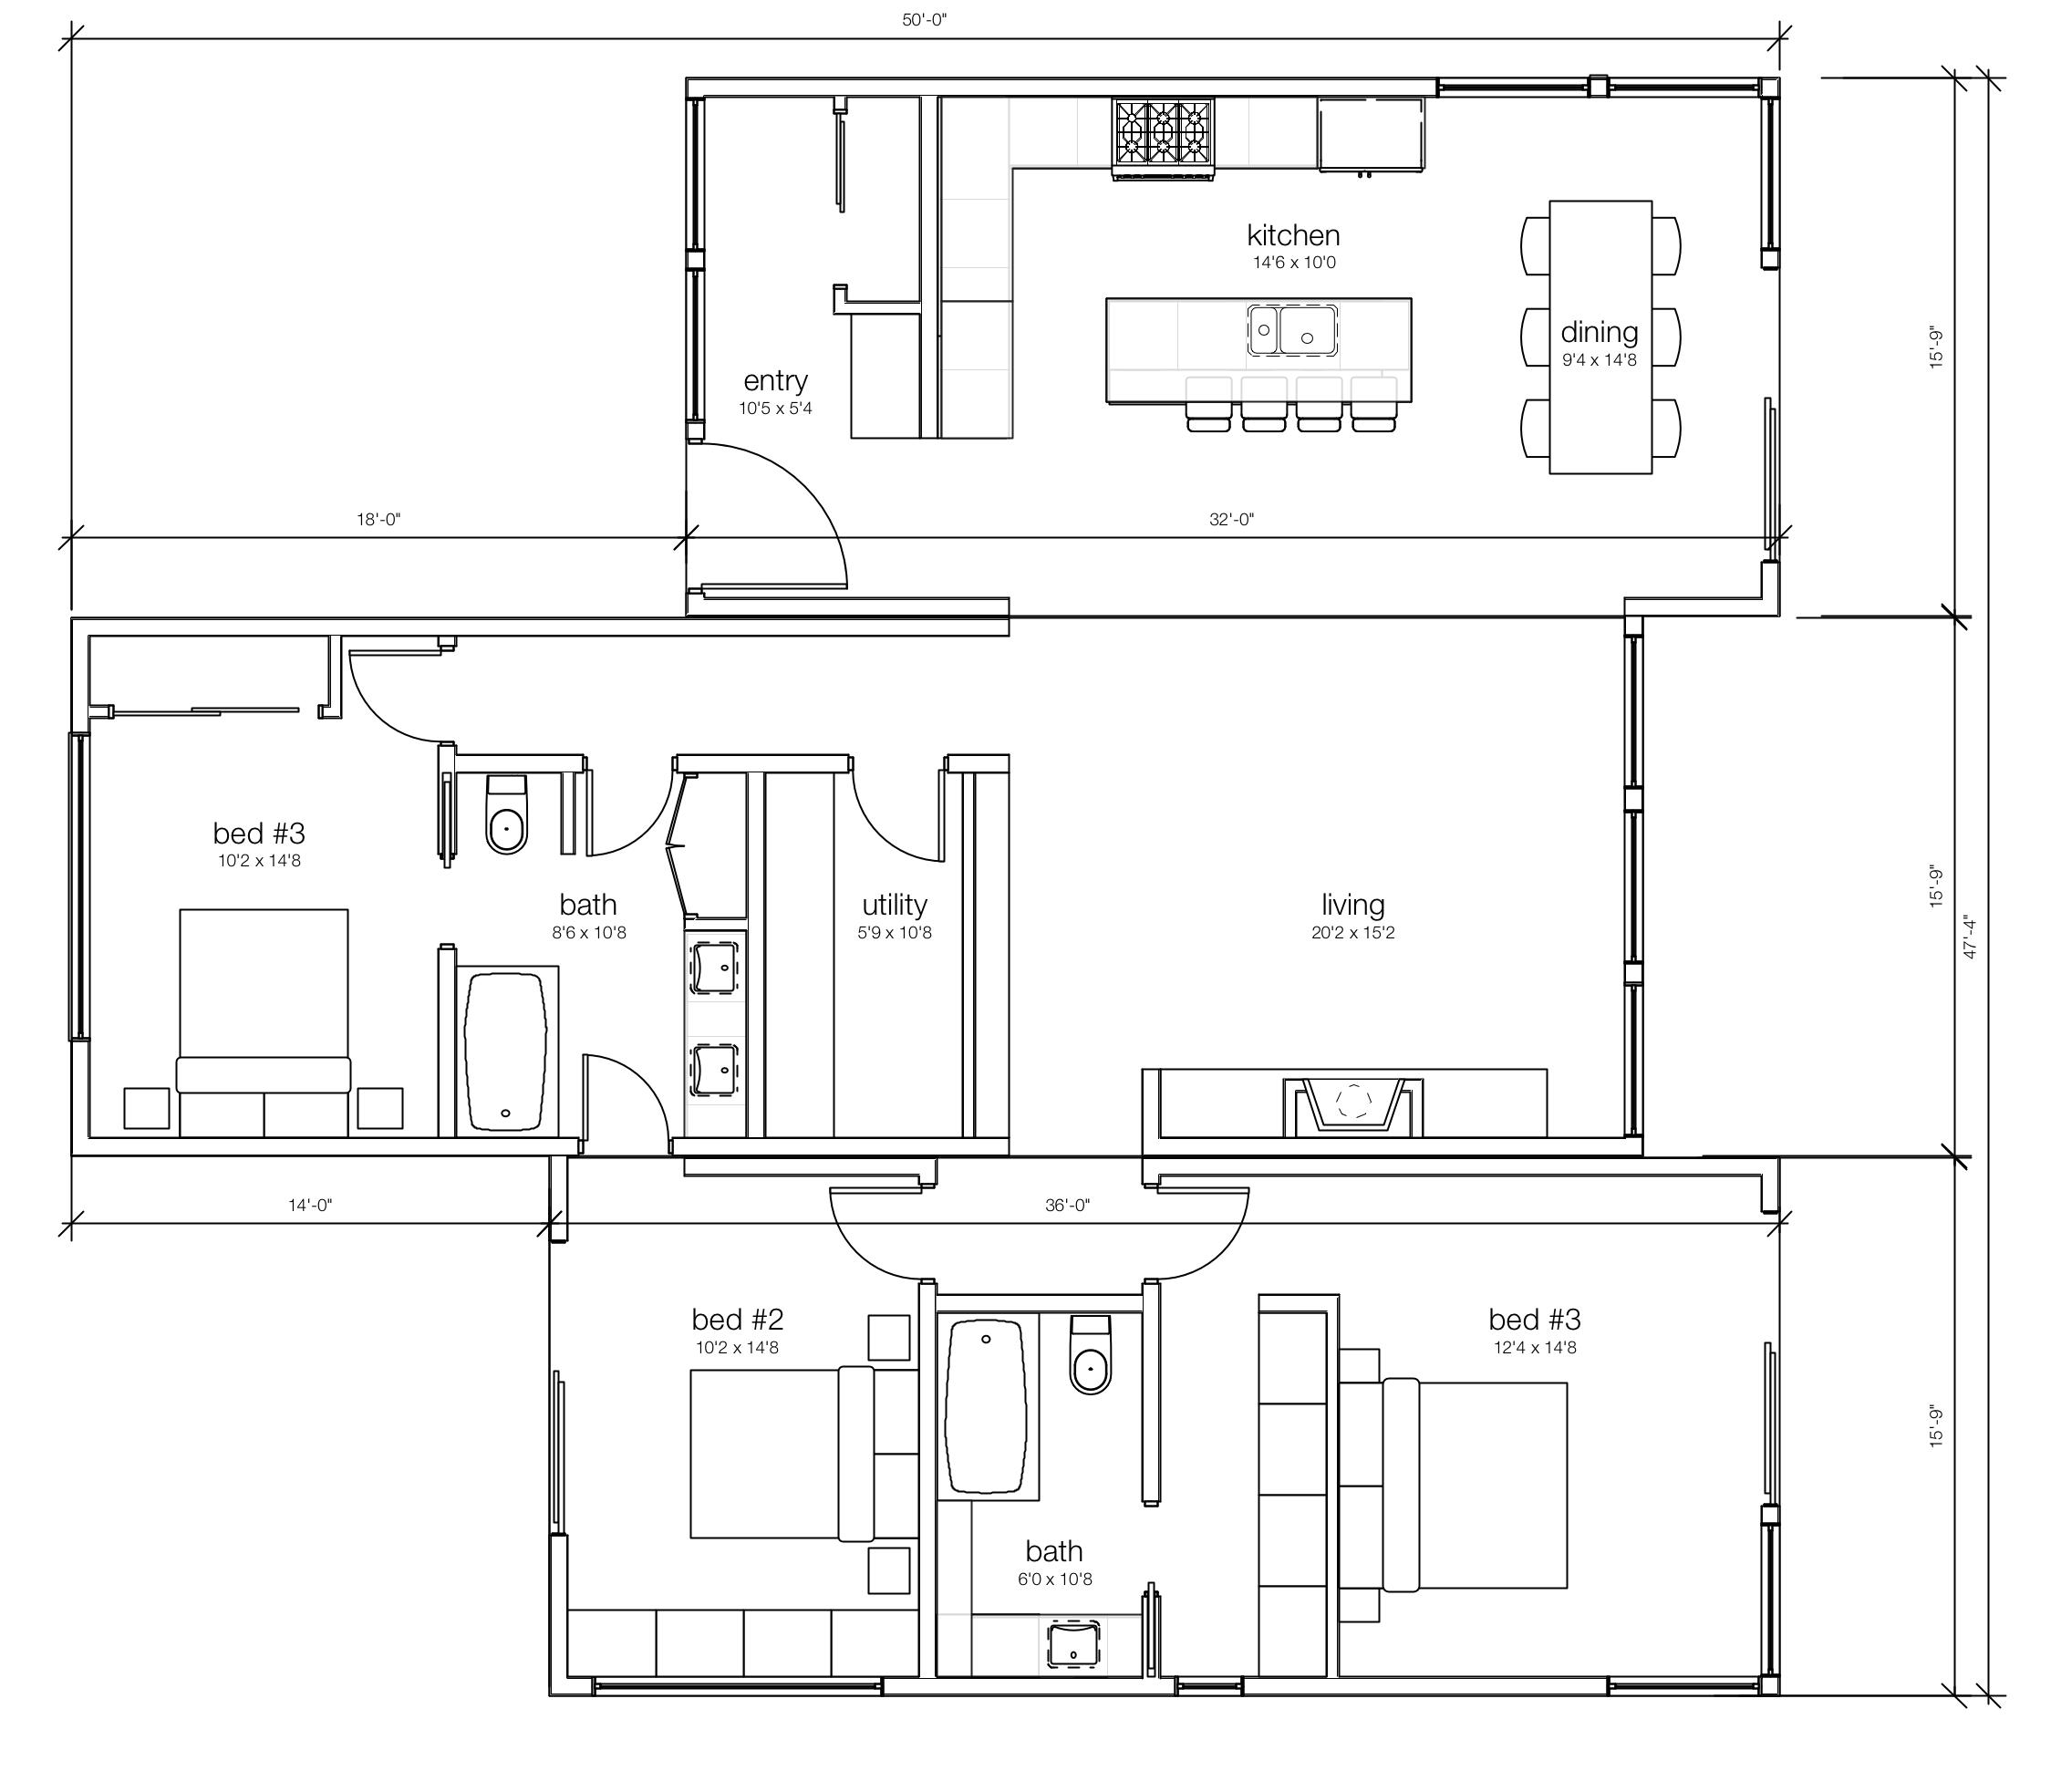 3 Bedroom Modular Home Or Prefab Home Designs The Fundy Prefab Homes 20x30 House Plans Craftsman Floor Plans